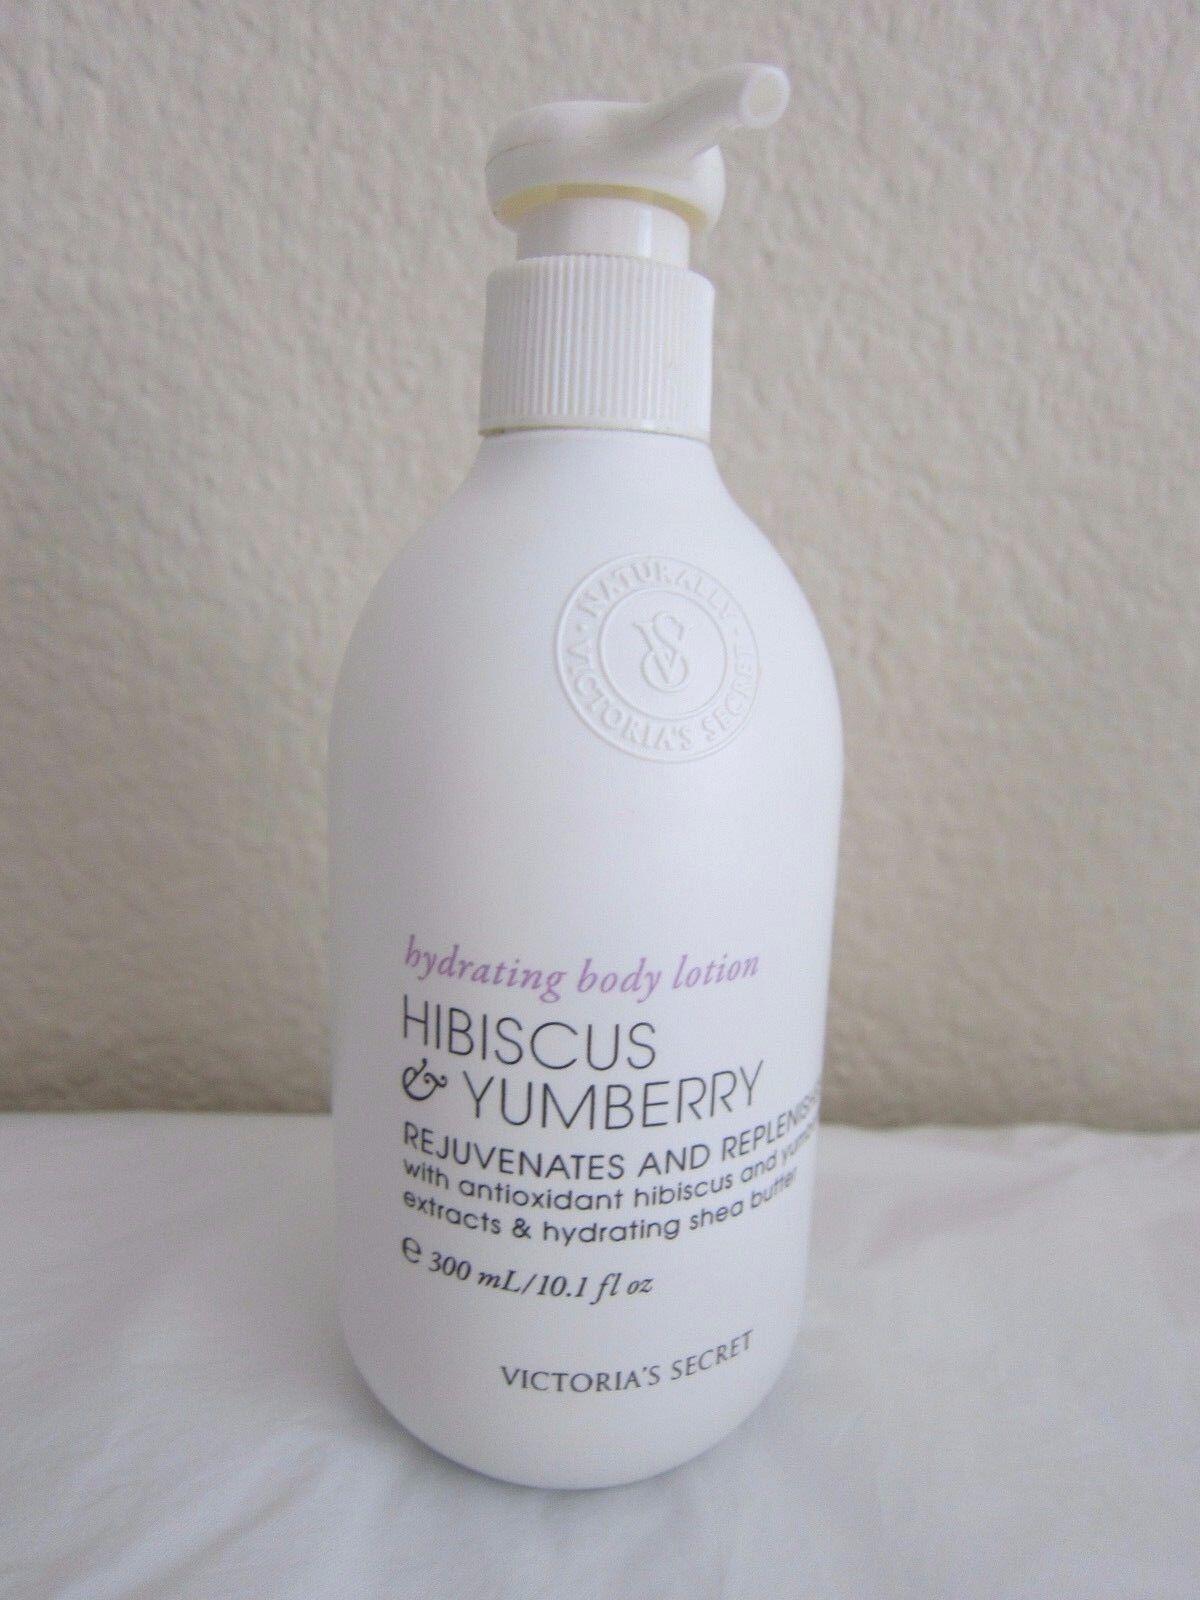 NEW RARE Victoria Secret HIBISCUS YUMBERRY HYDRATING BODY LO